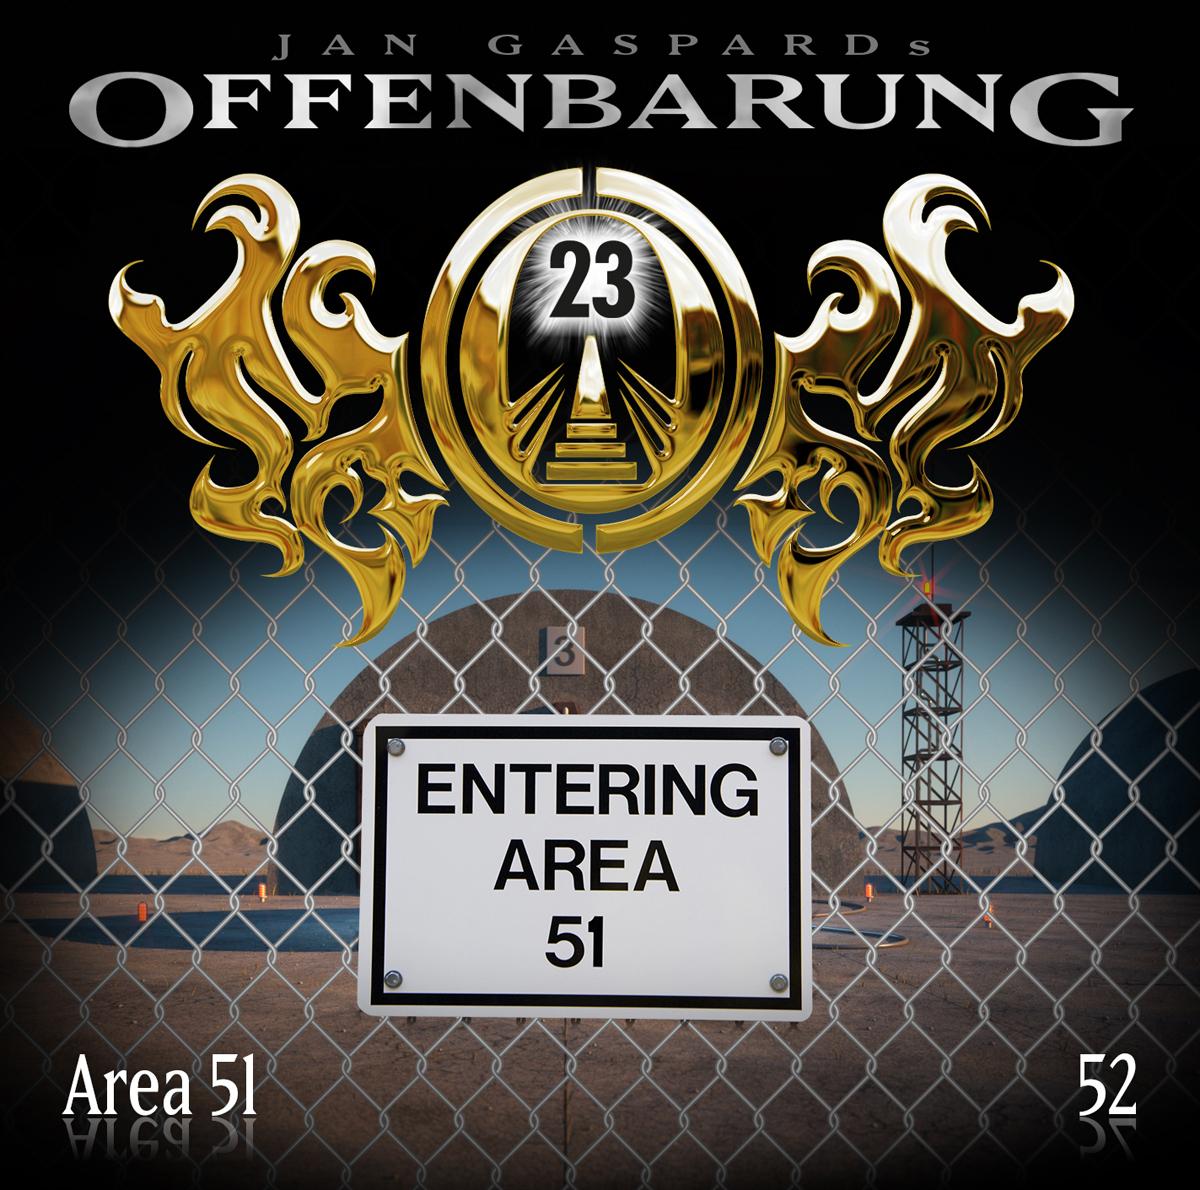 Offenbarung 23 - Area 51 (Offenbarung 23, #52)  by  Jan Gaspard